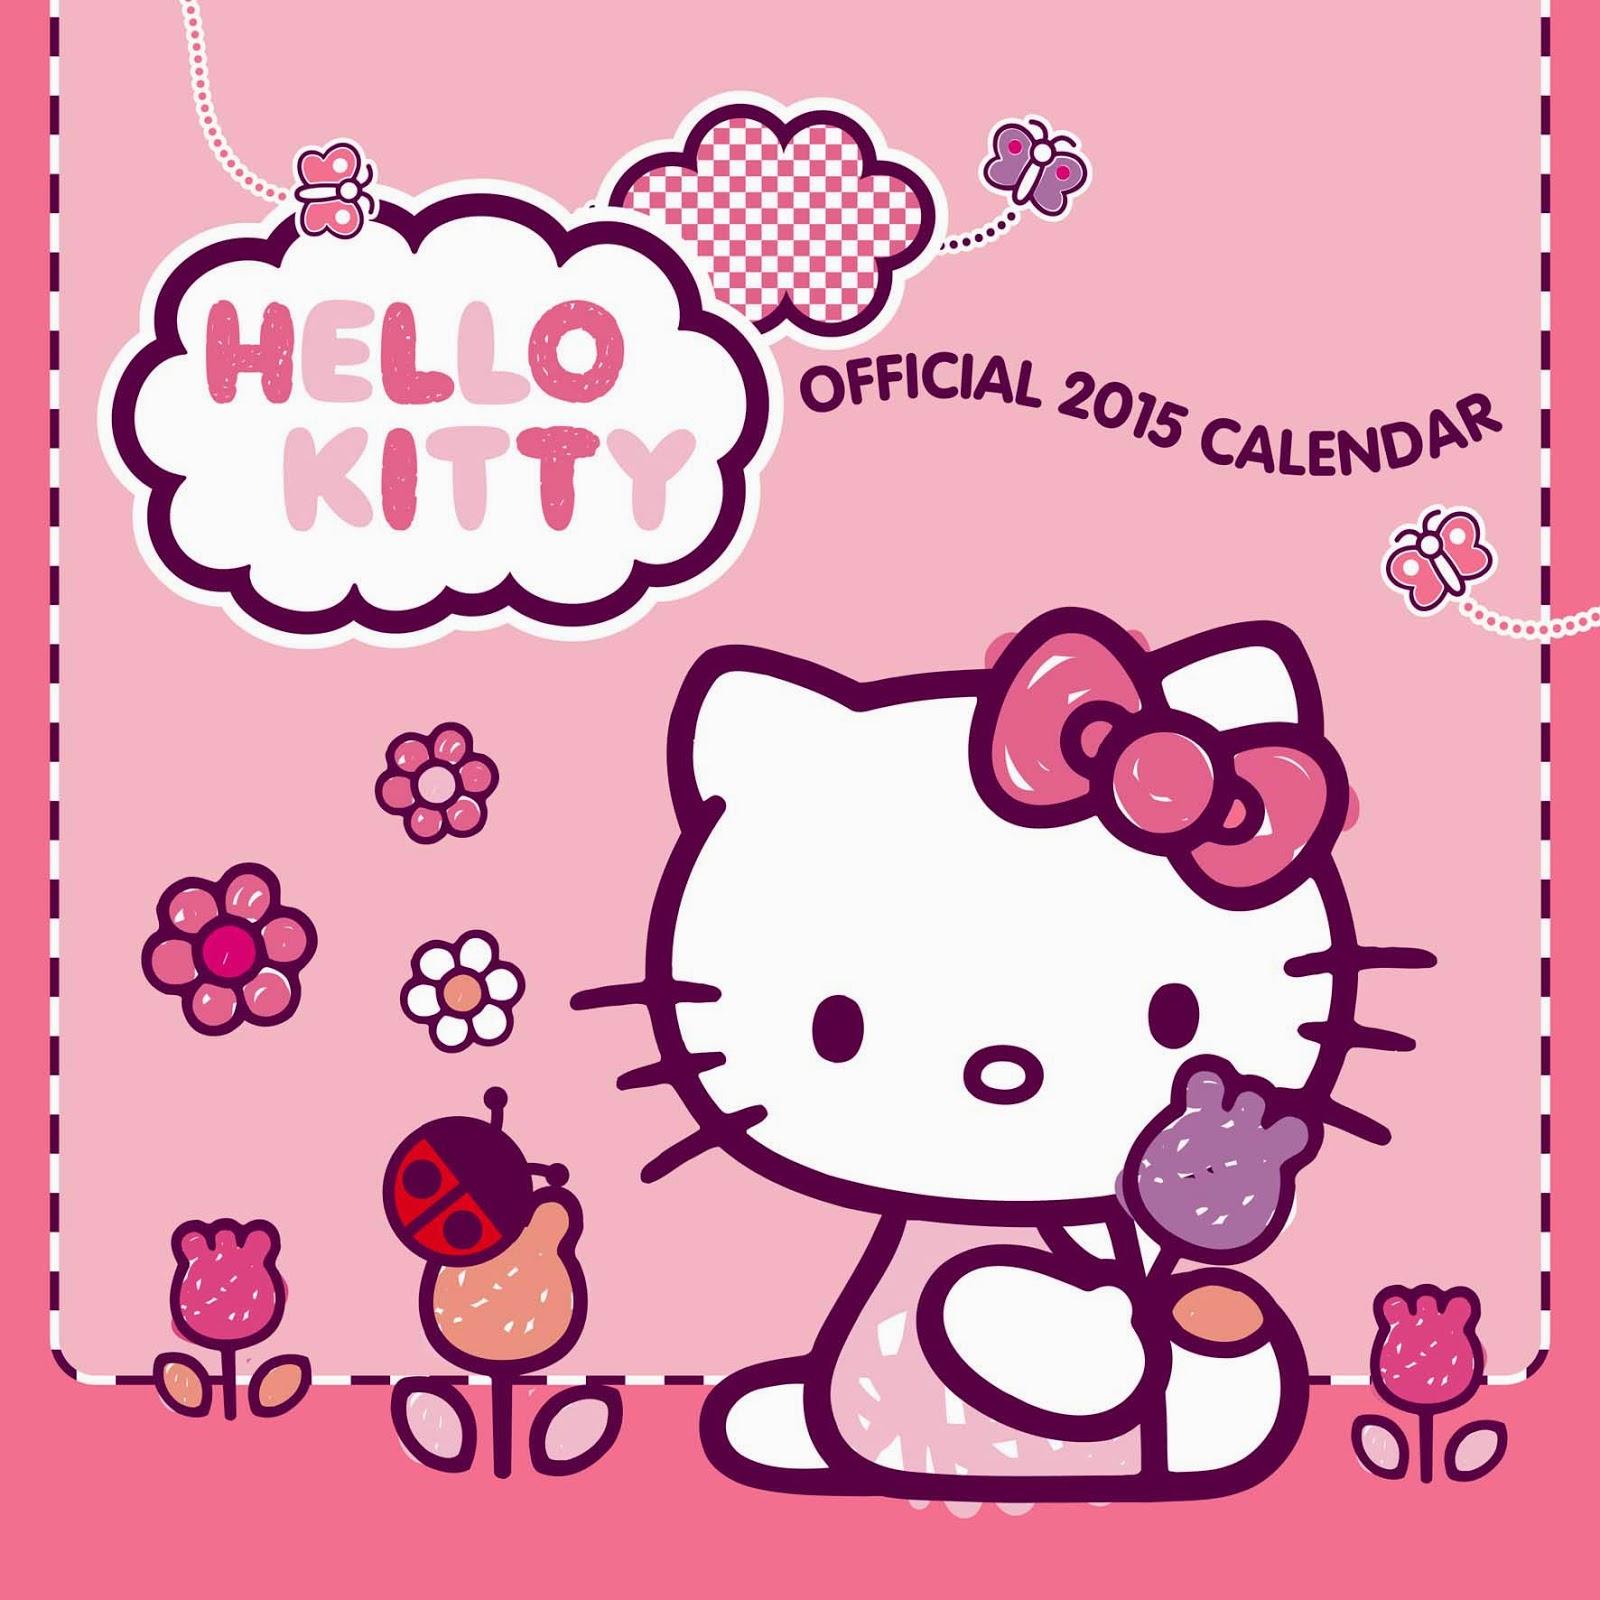 Hello Kitty Wallpapers 2015 WallpaperSafari